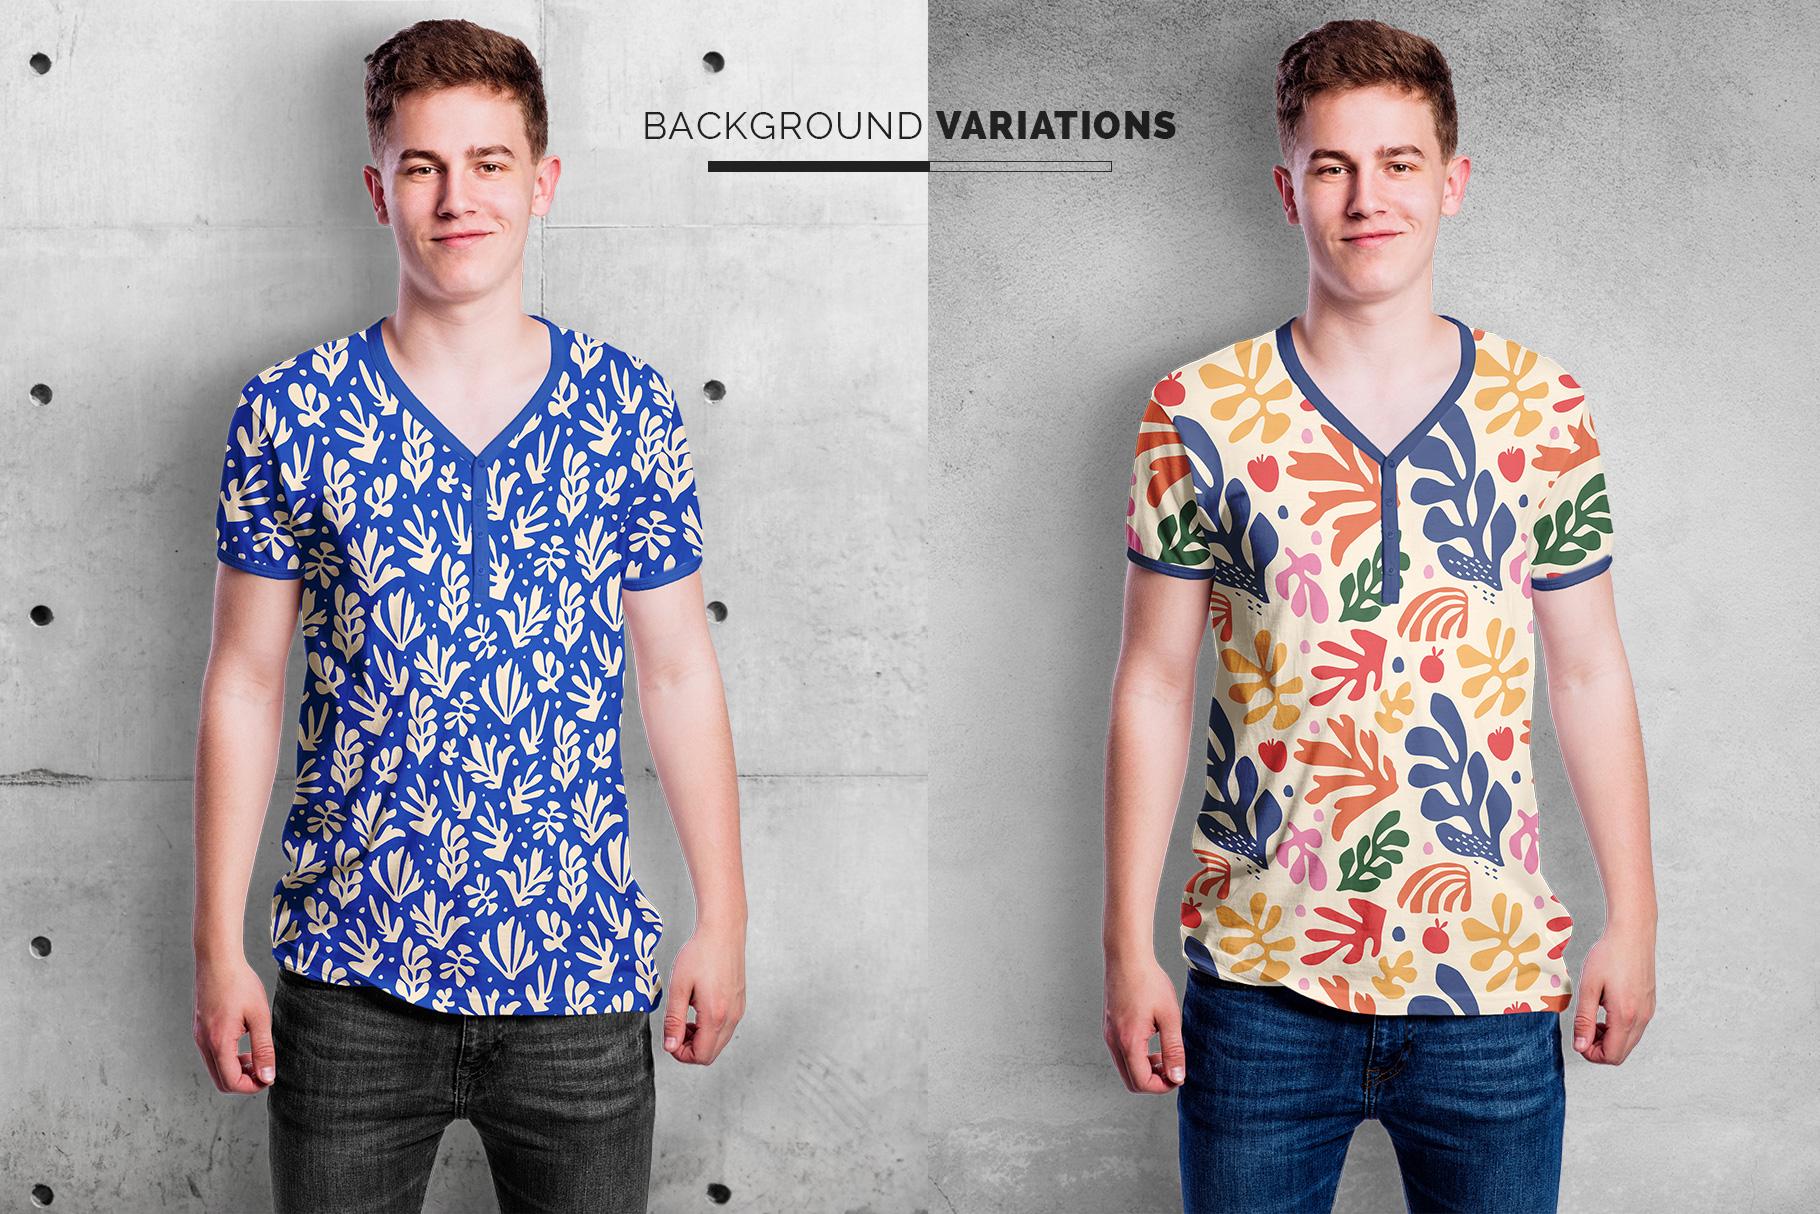 background options of the mens vneck tshirt mockup